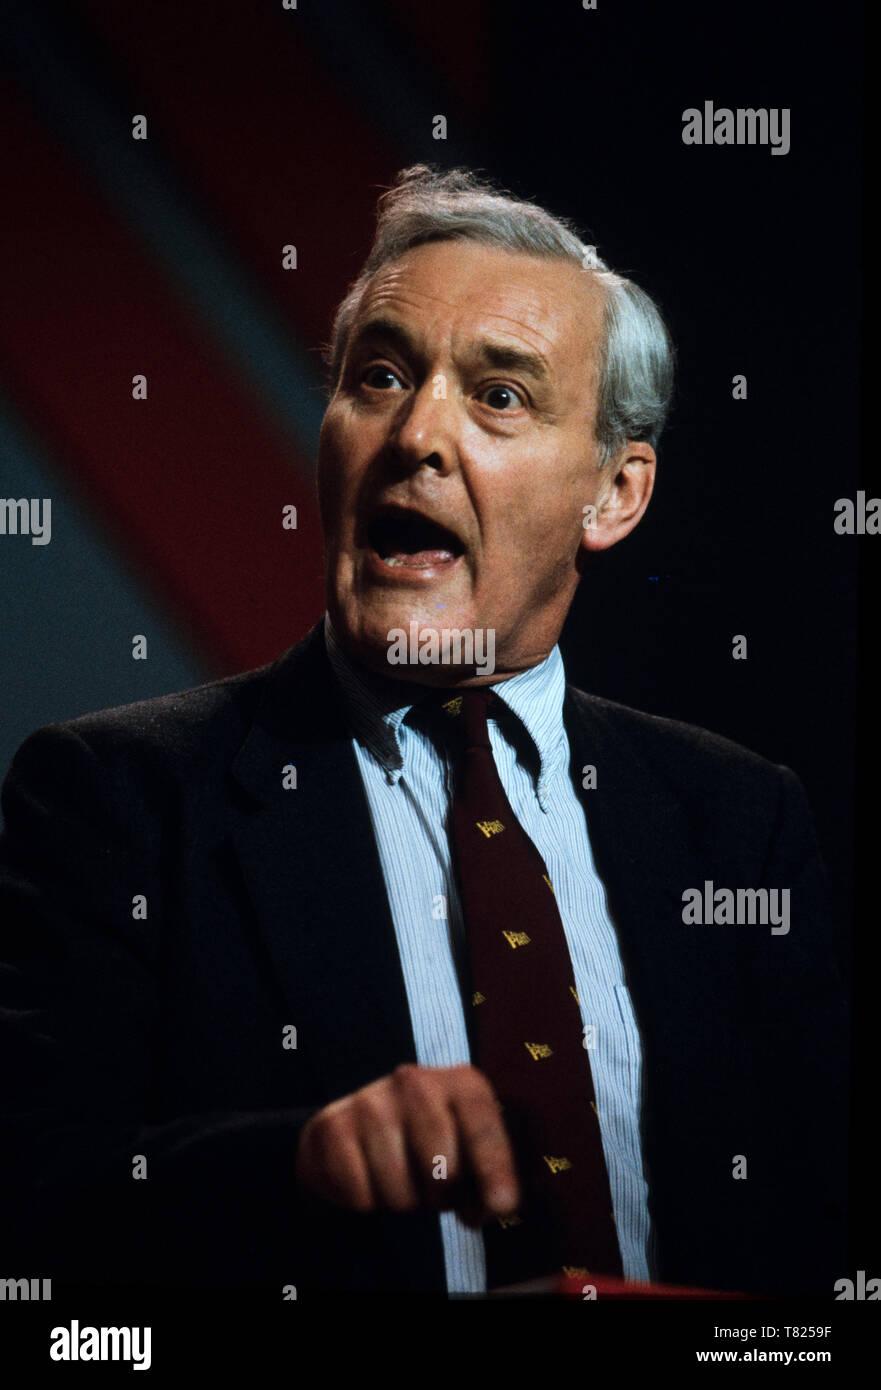 Tony Benn Mp Stock Photos & Tony Benn Mp Stock Images - Alamy